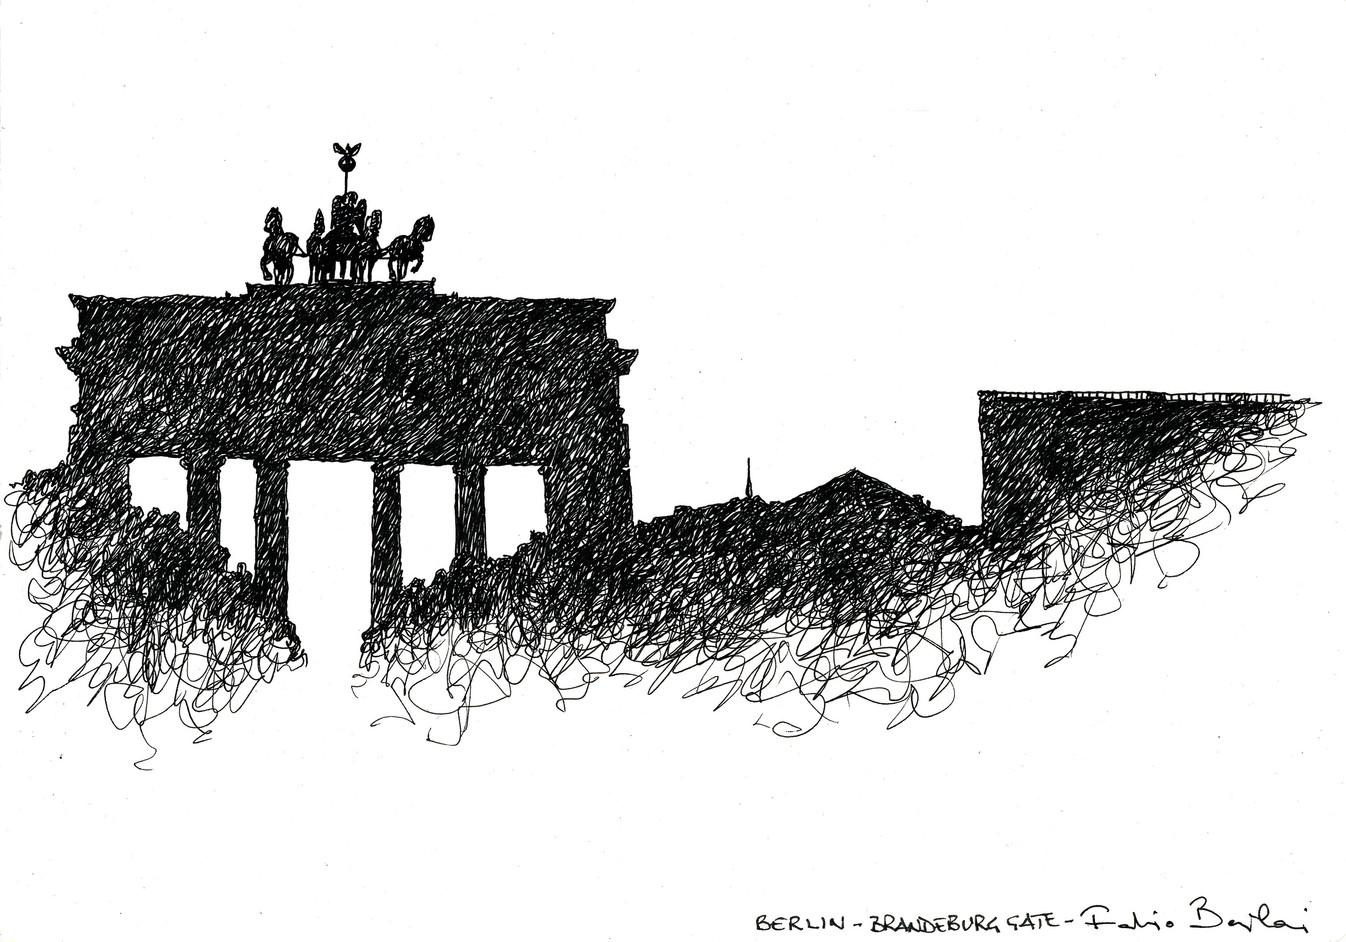 Berlin _ Brandeburg Gate